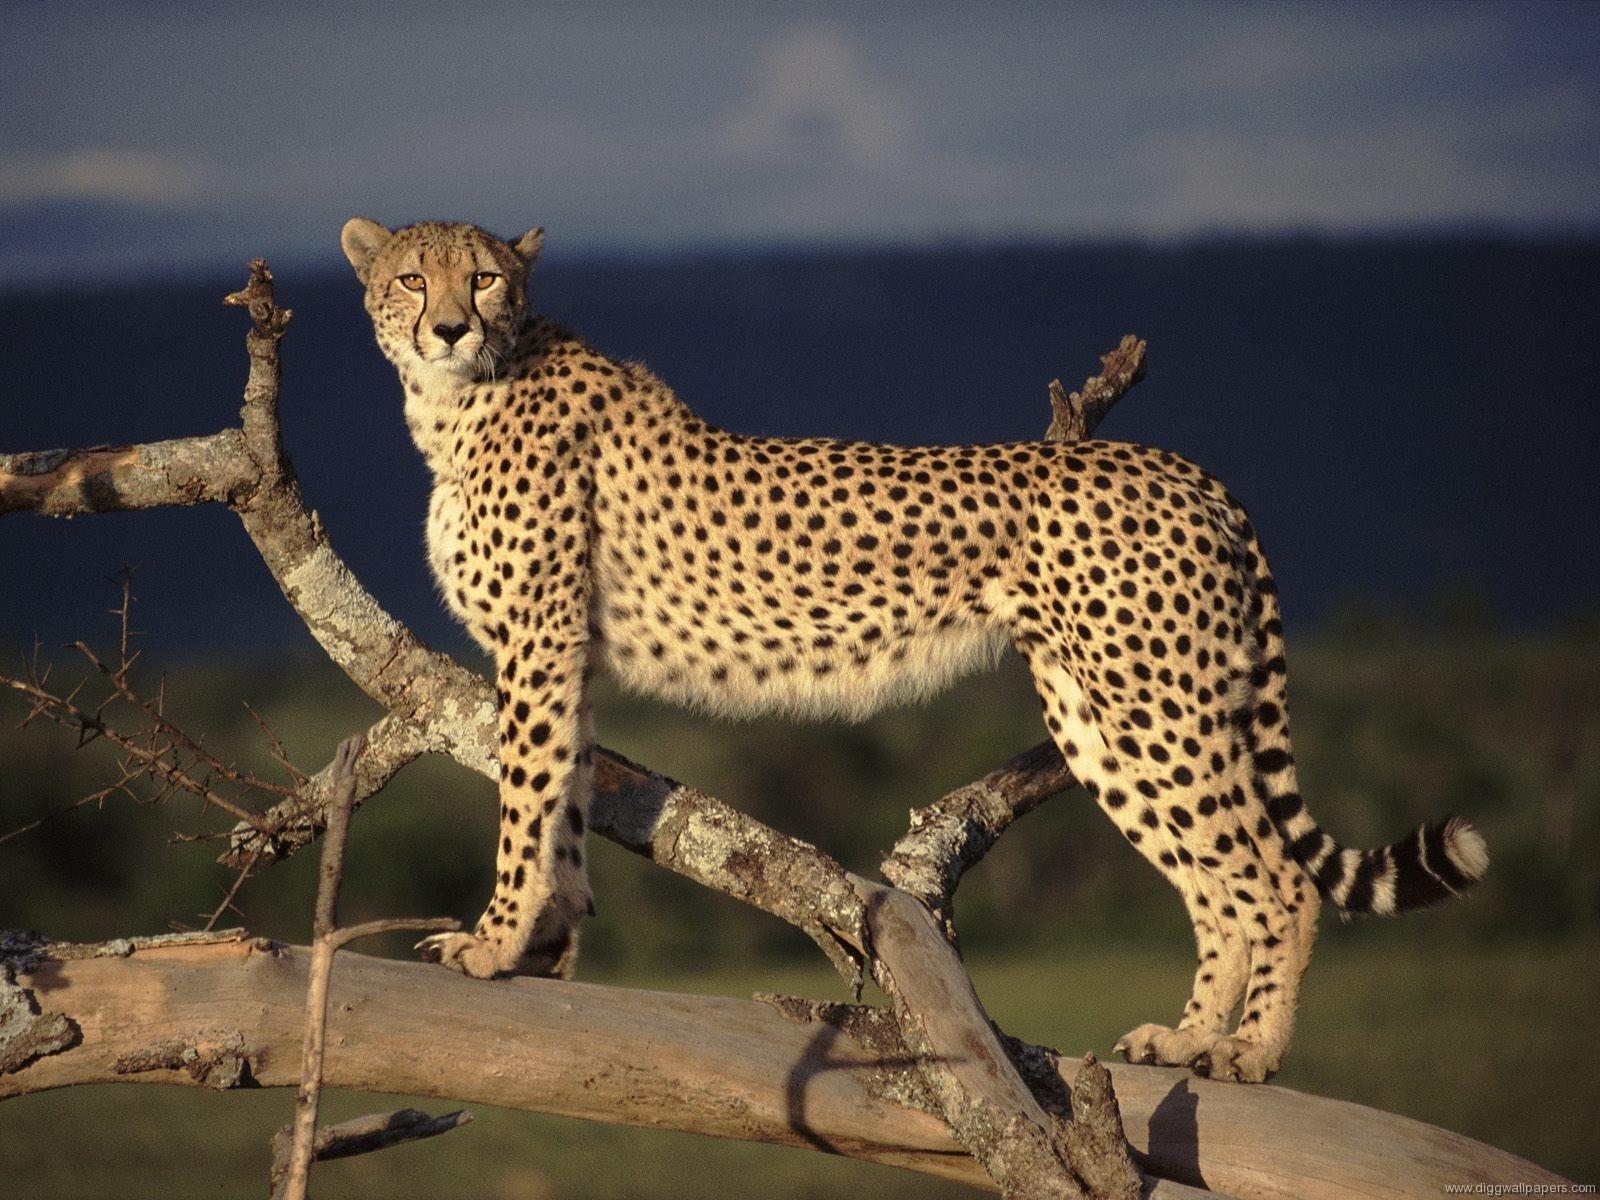 Yuz-e Irani (The Asiatic cheetah) - Welcome to Iran